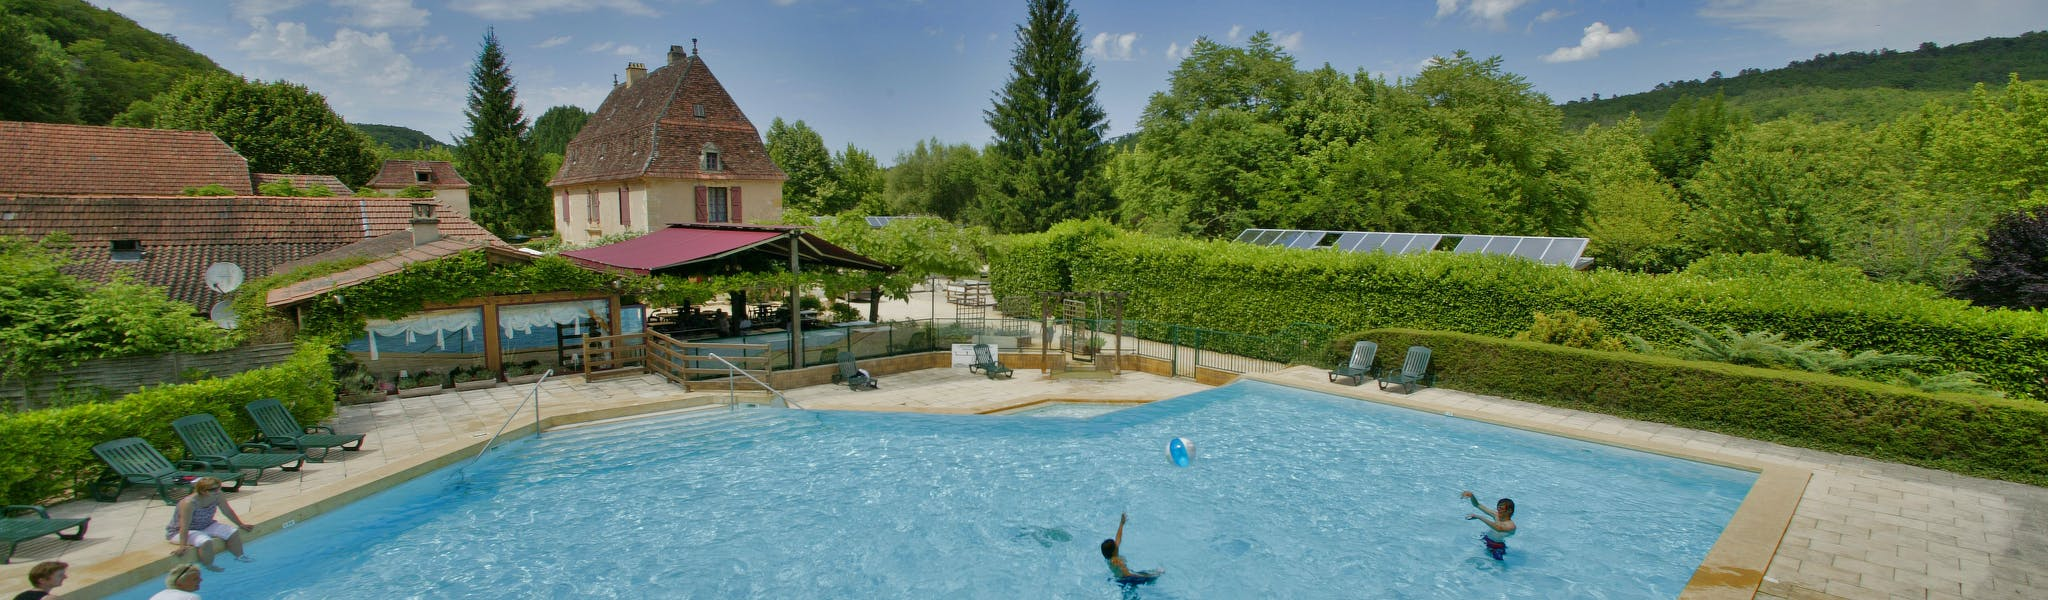 Zwembad Camping La Riviere